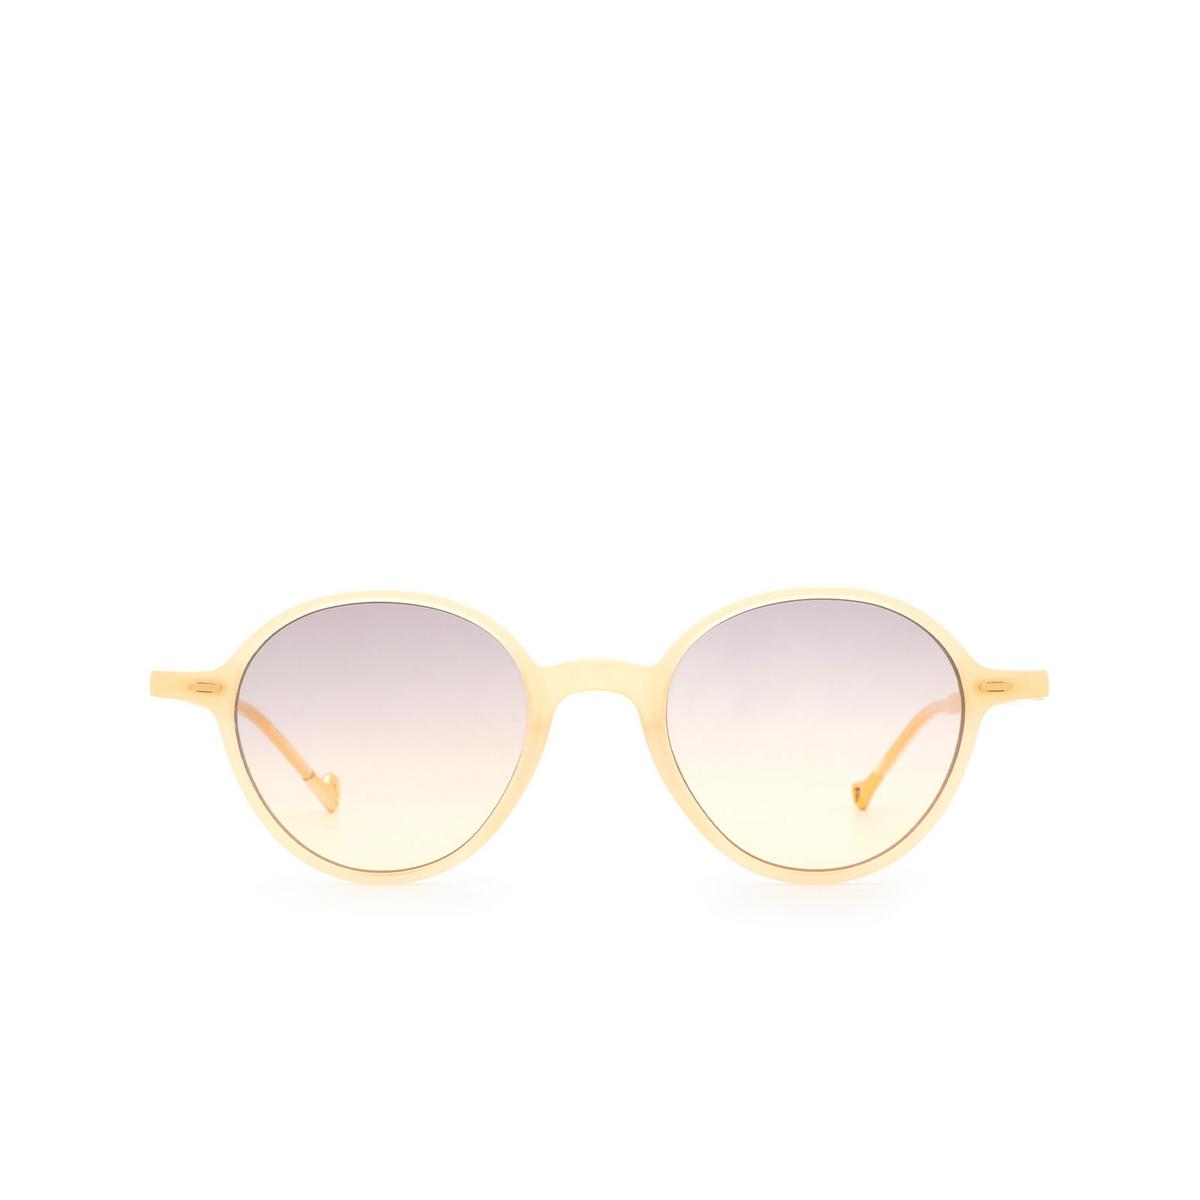 Eyepetizer® Round Sunglasses: Sforza color Honey C.C/C-19 - front view.